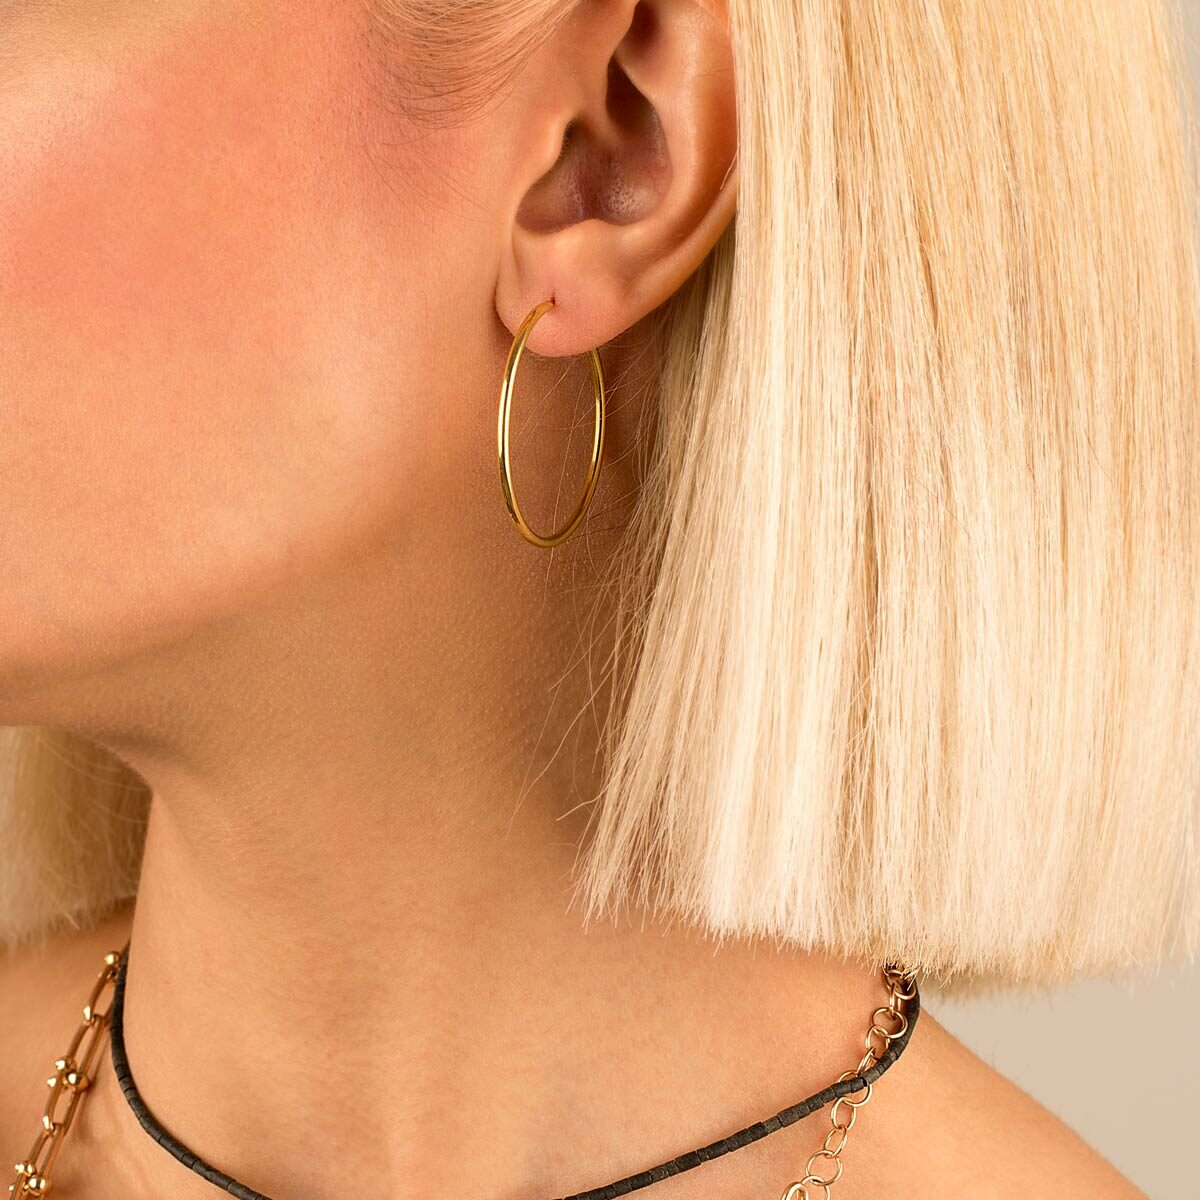 گوشواره طلا حلقه بزرگ